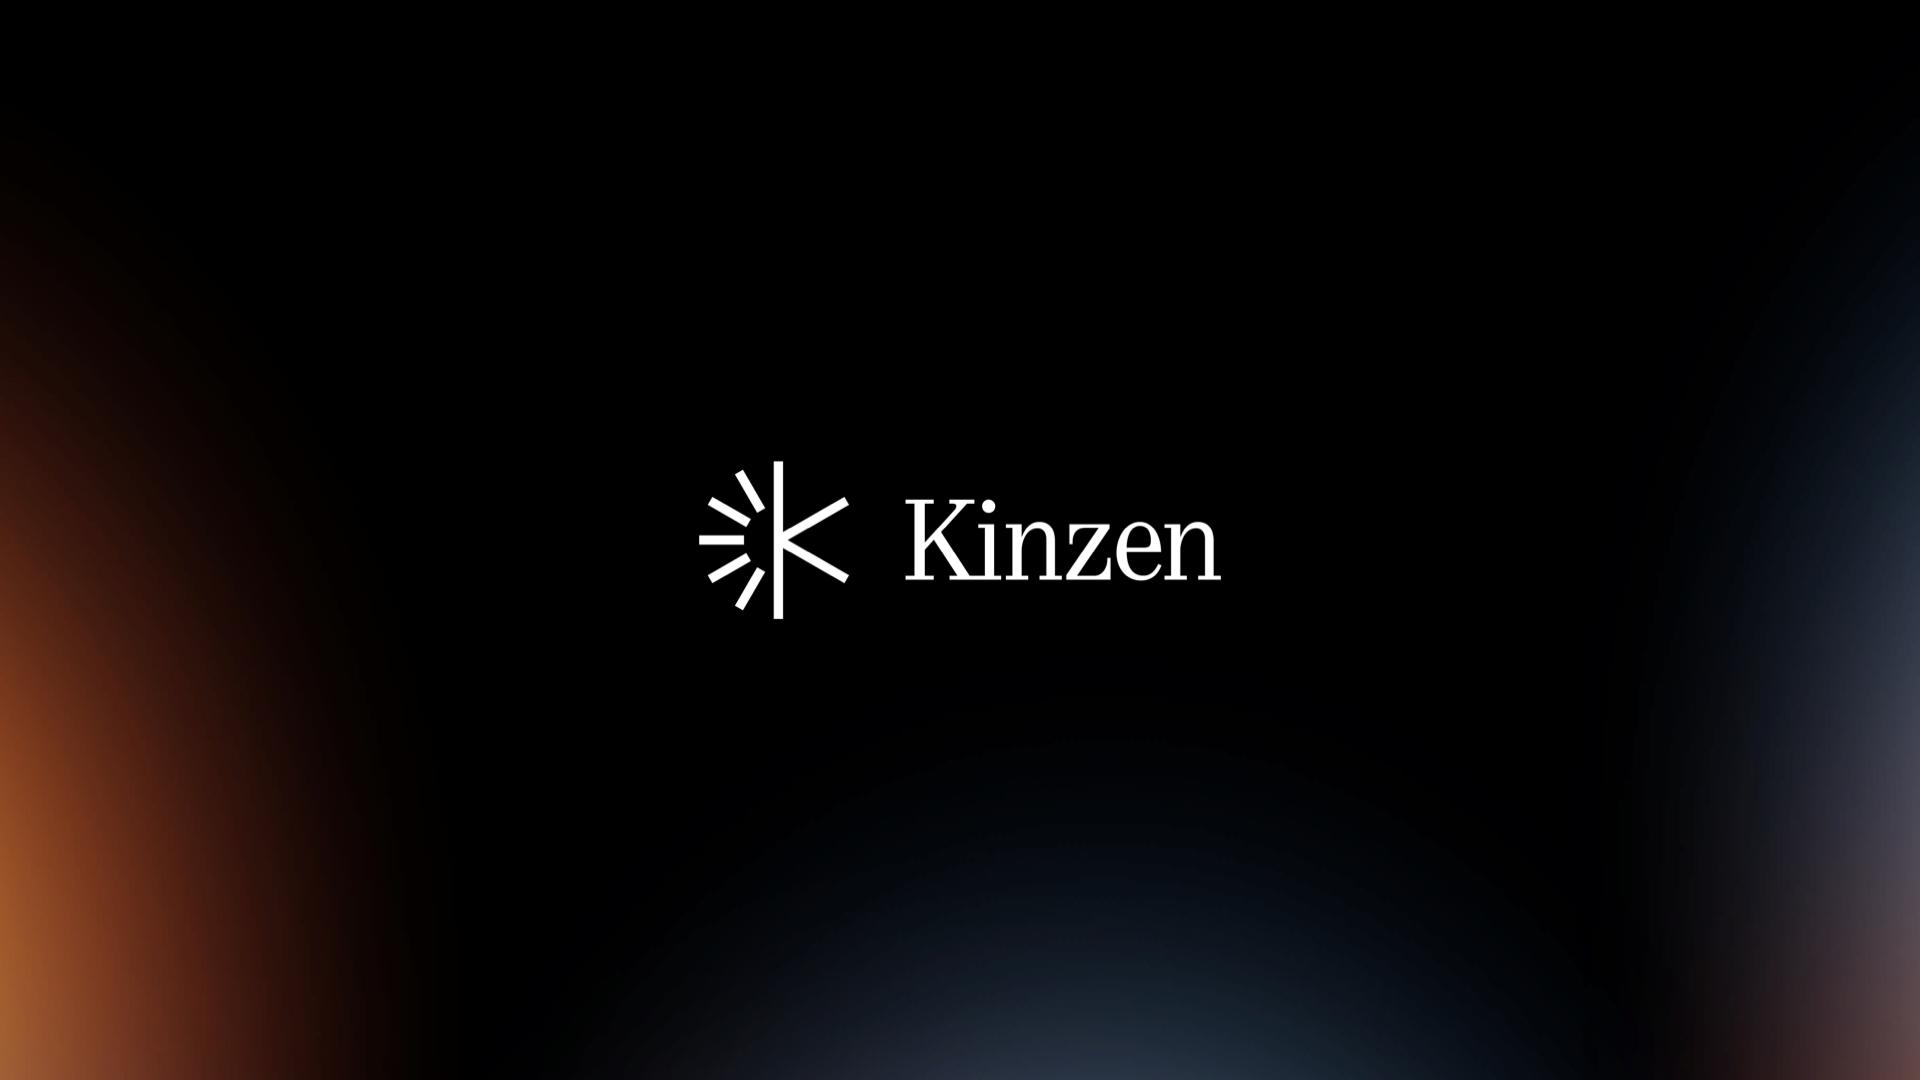 Cover image: Kinzen